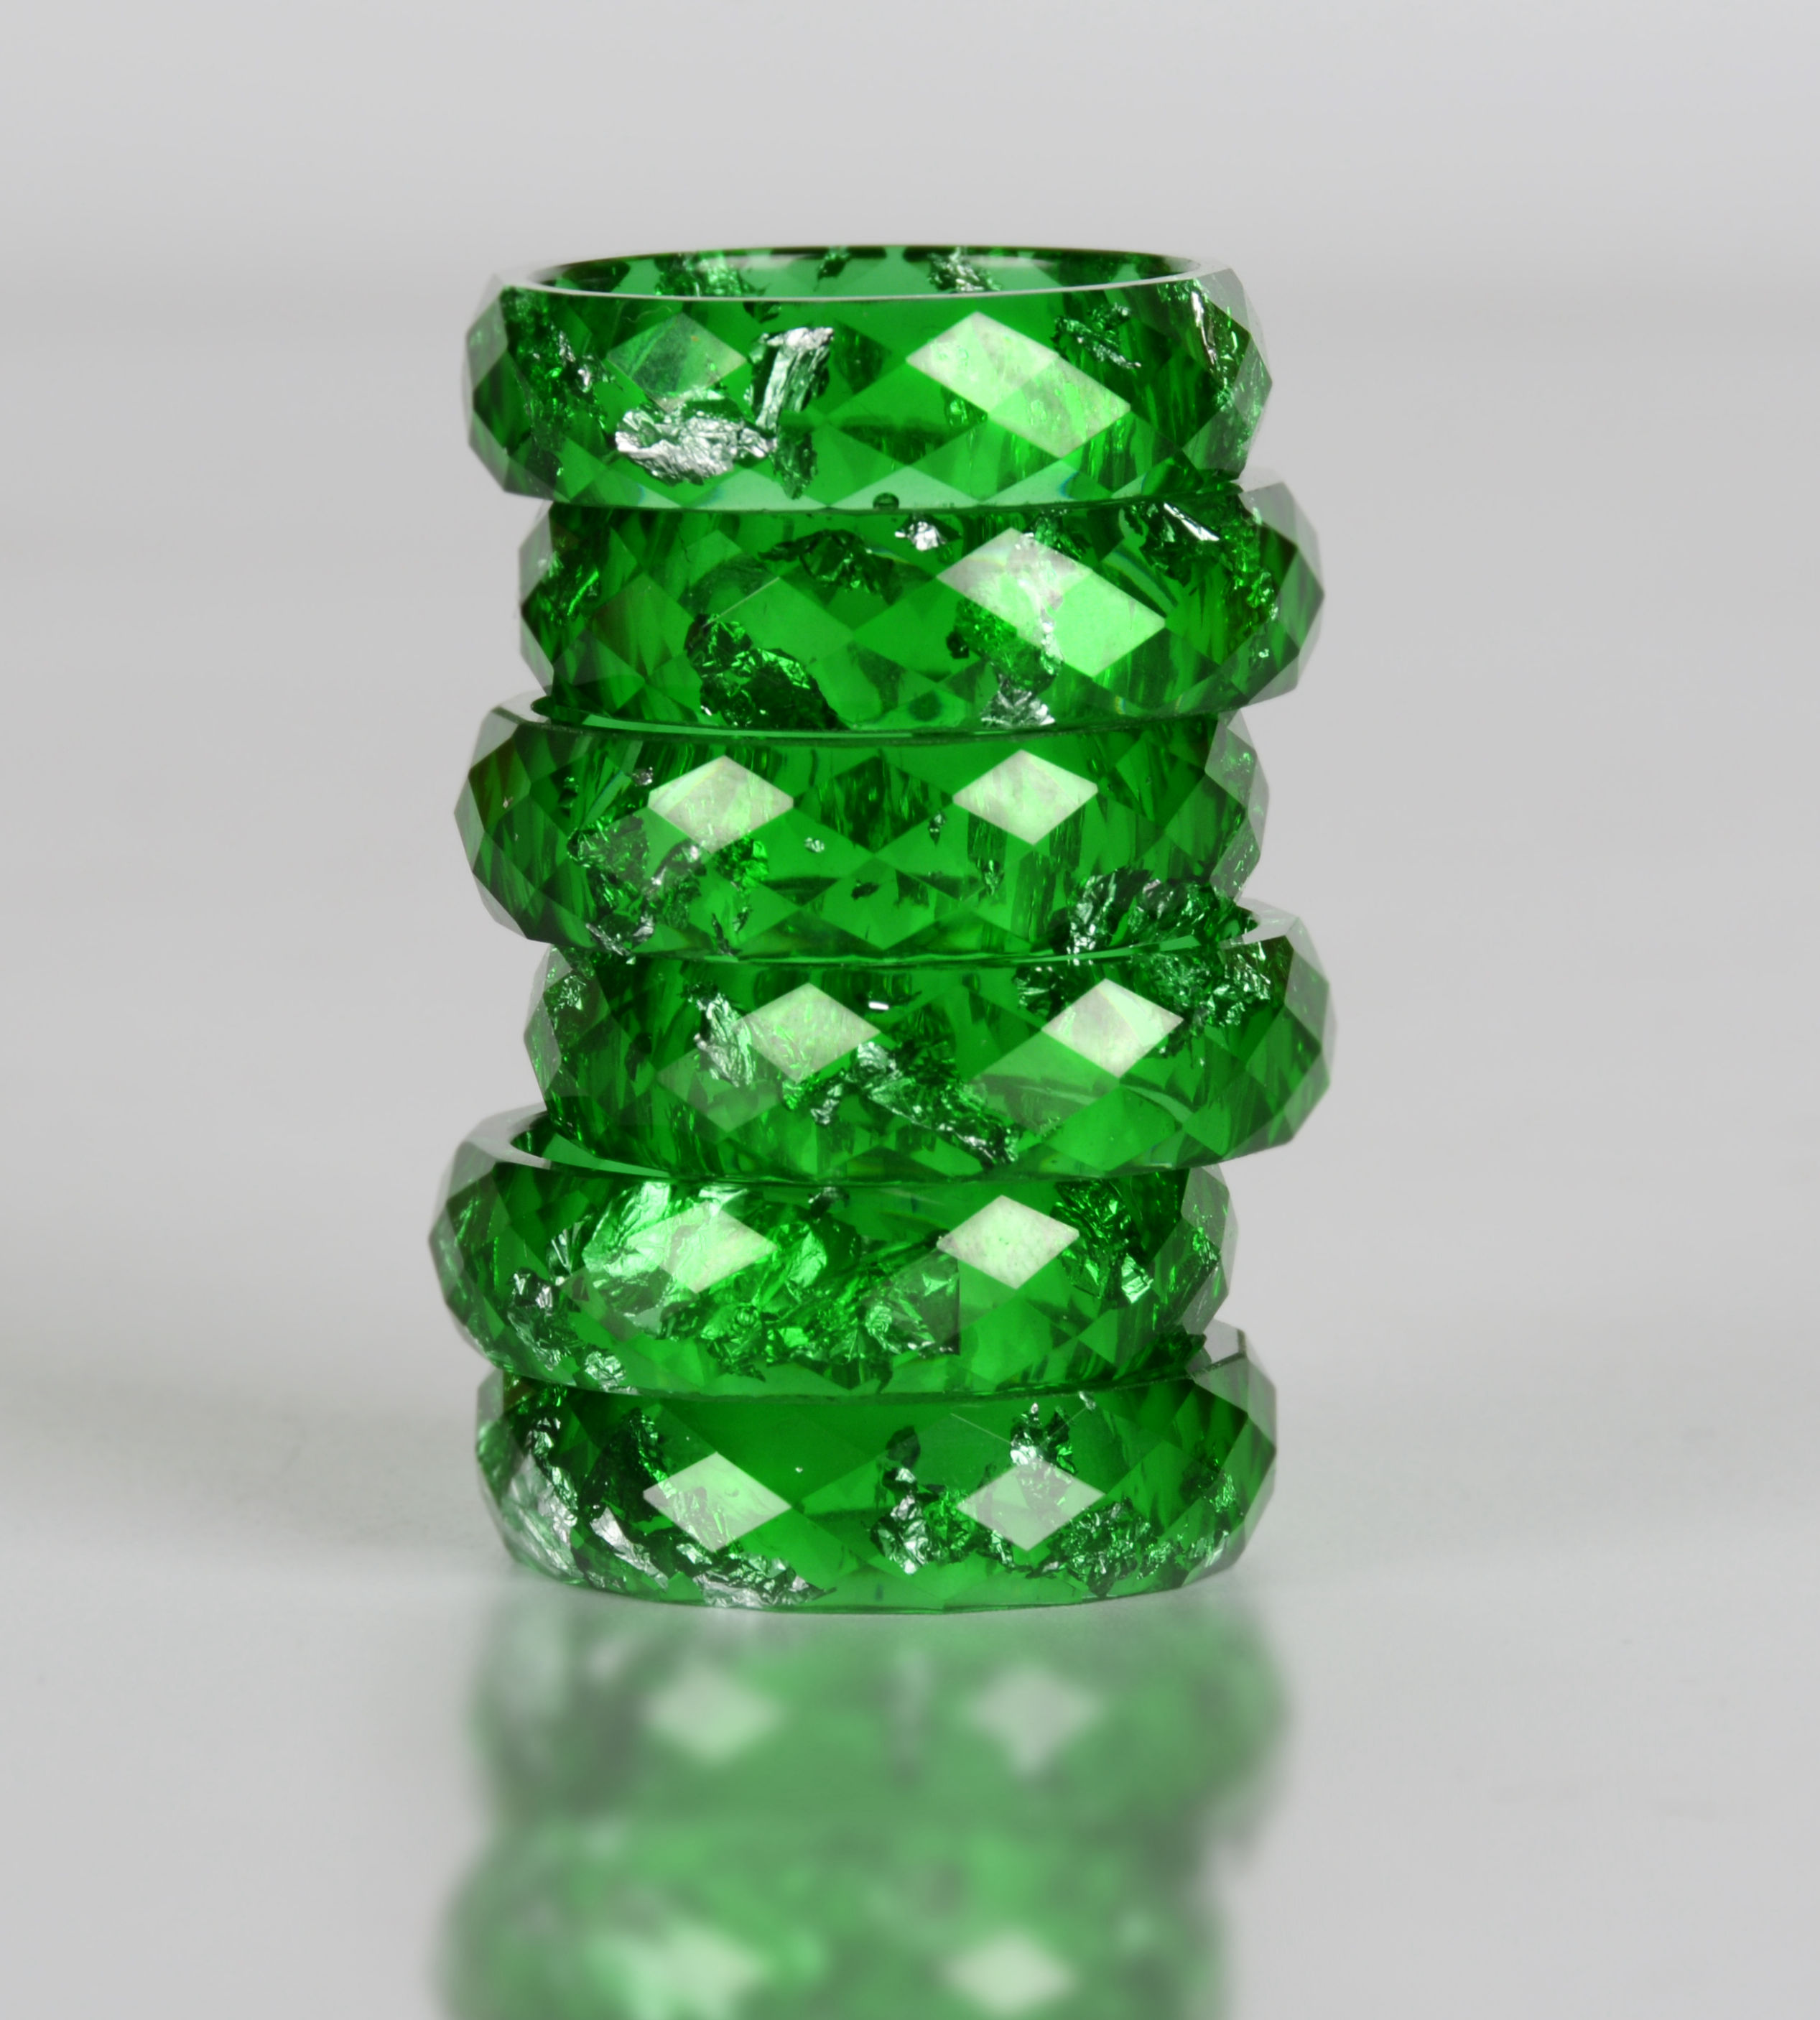 Hdf6acbba30d44c06b773d9caf260251di - Crystalic Resin Ring